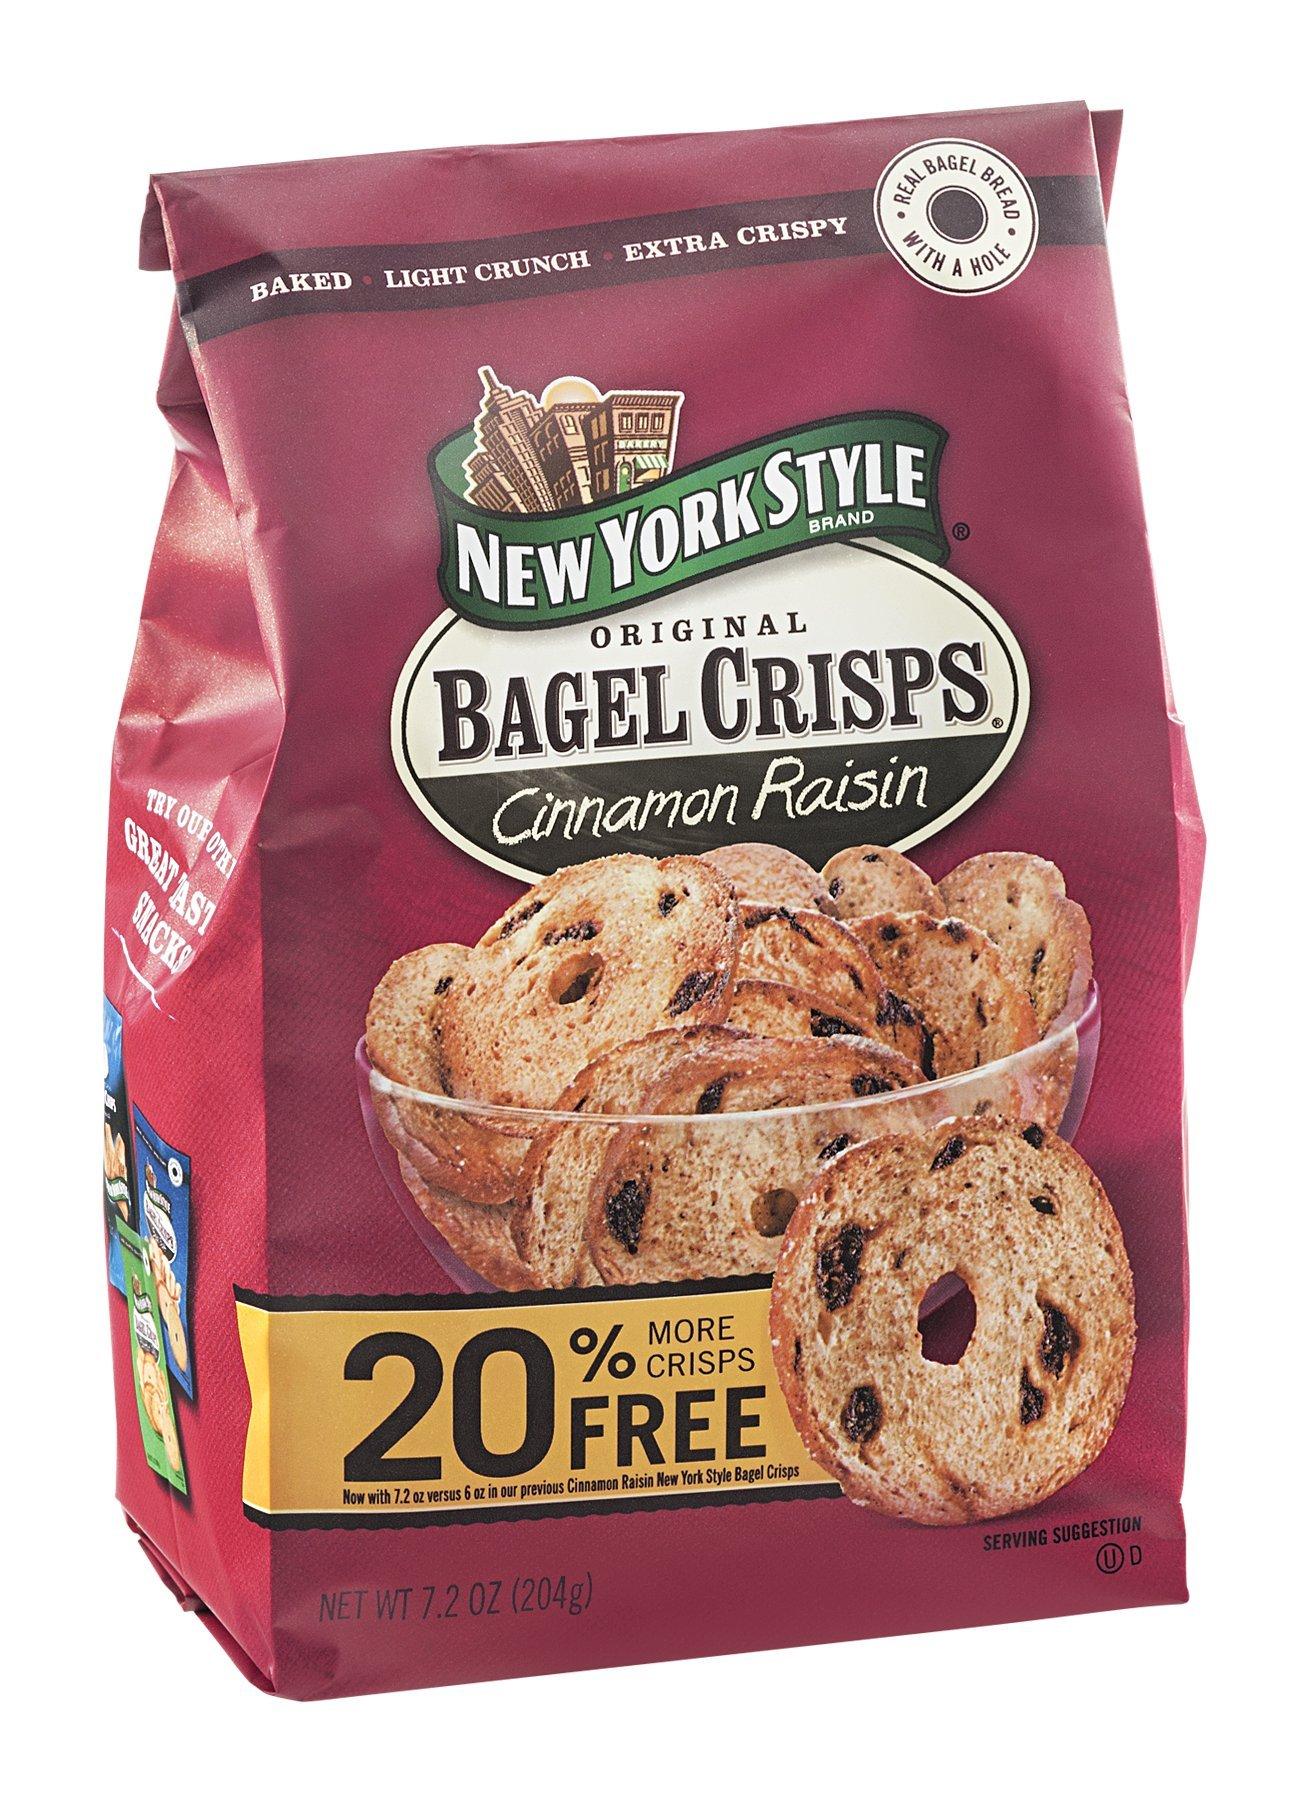 New York Style Bagel Crsp Cinn Raisin